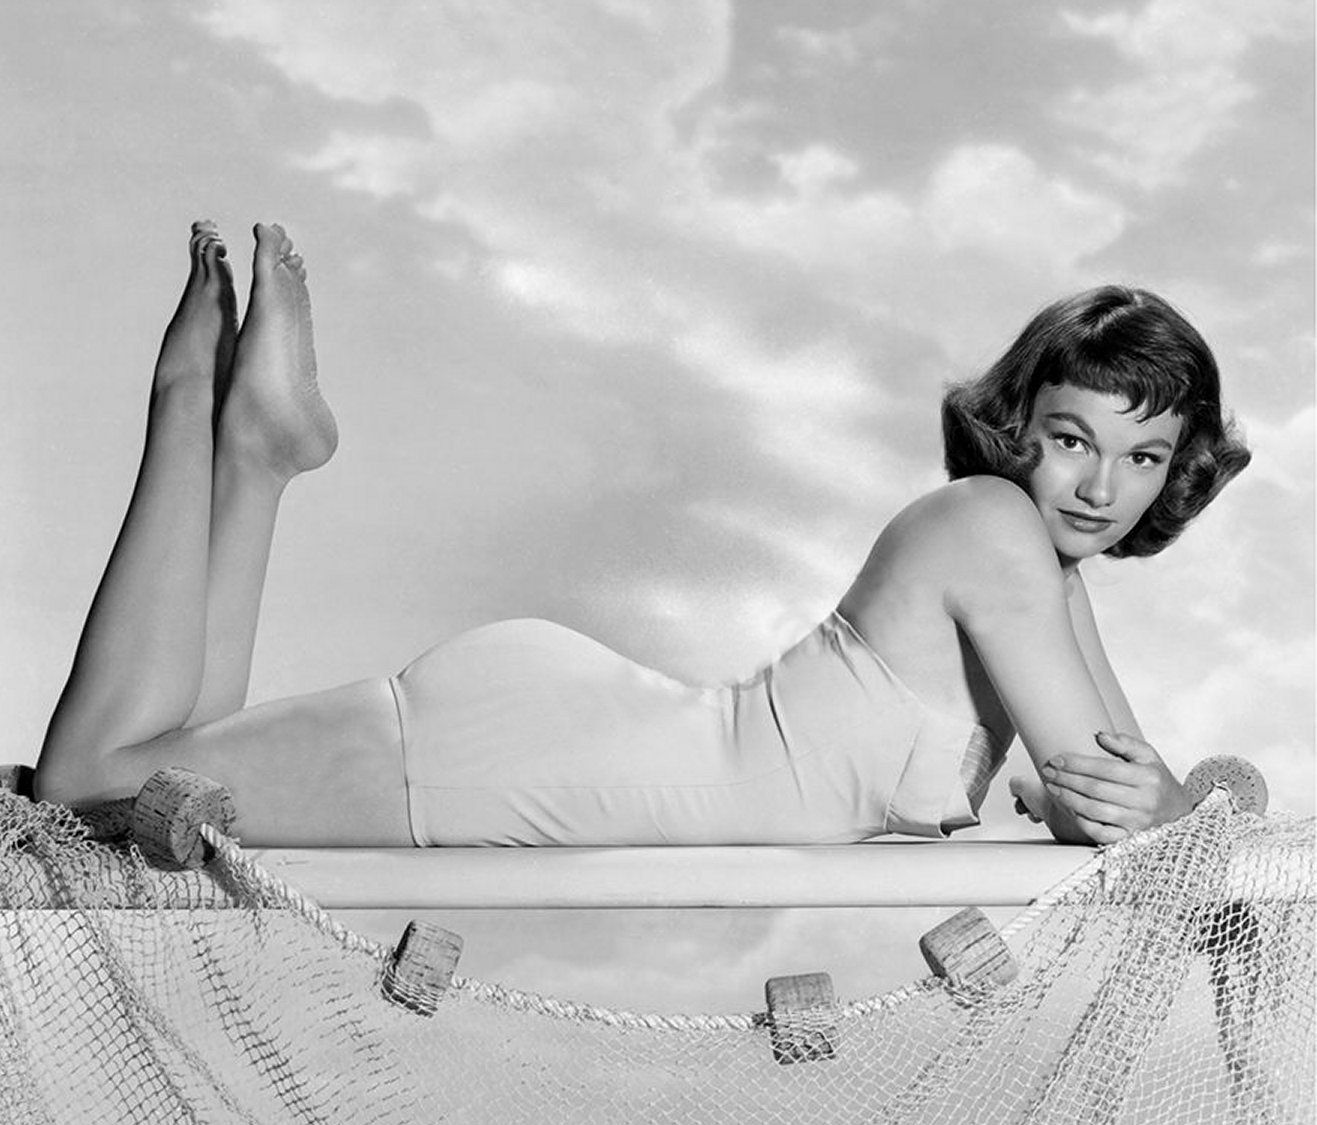 Gloria Talbott 1950s | 8x10 photo, Photo, Gloria